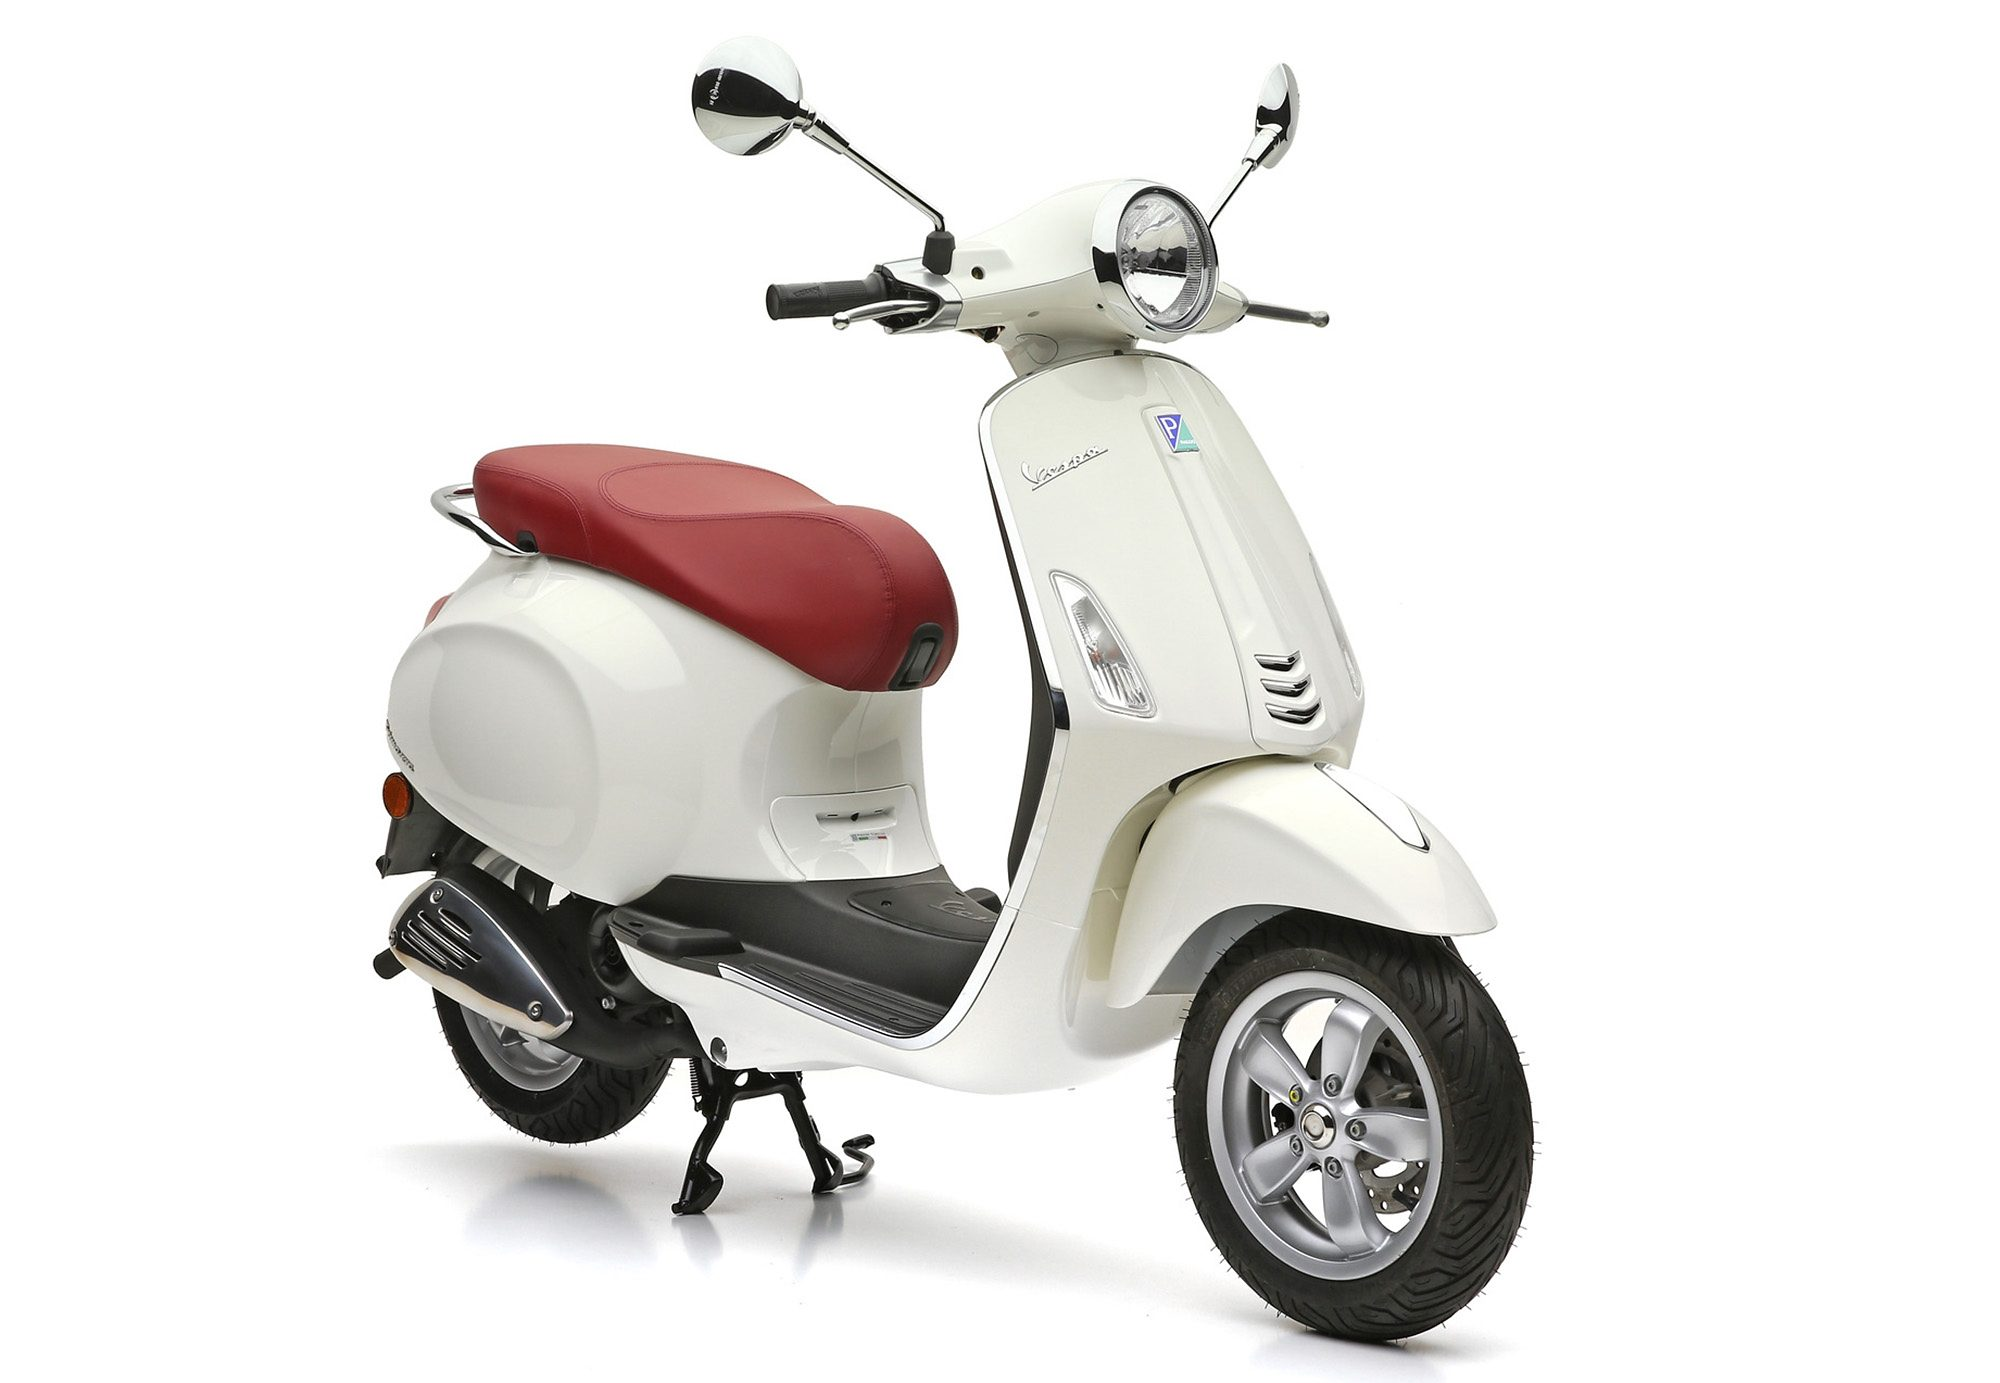 Mofaroller, 49 ccm, 4,35 PS, 25 km/h, weiss, »Primavera«, Vespa